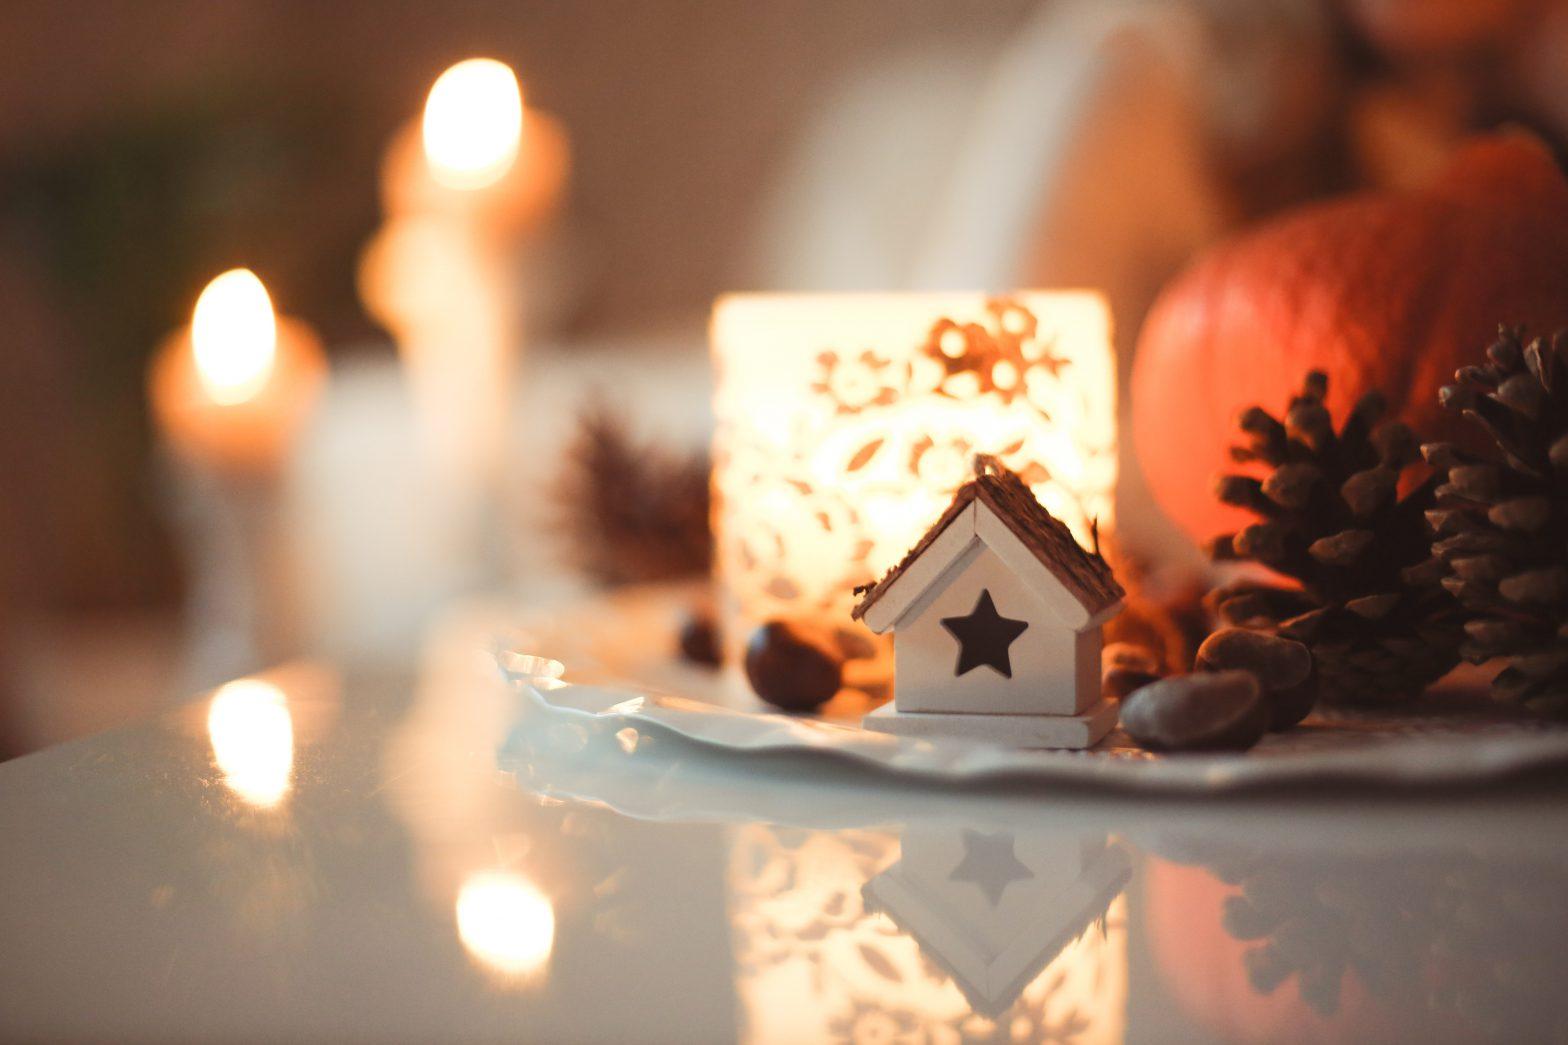 Pomysły na desery z dynią – idealne na jesień!